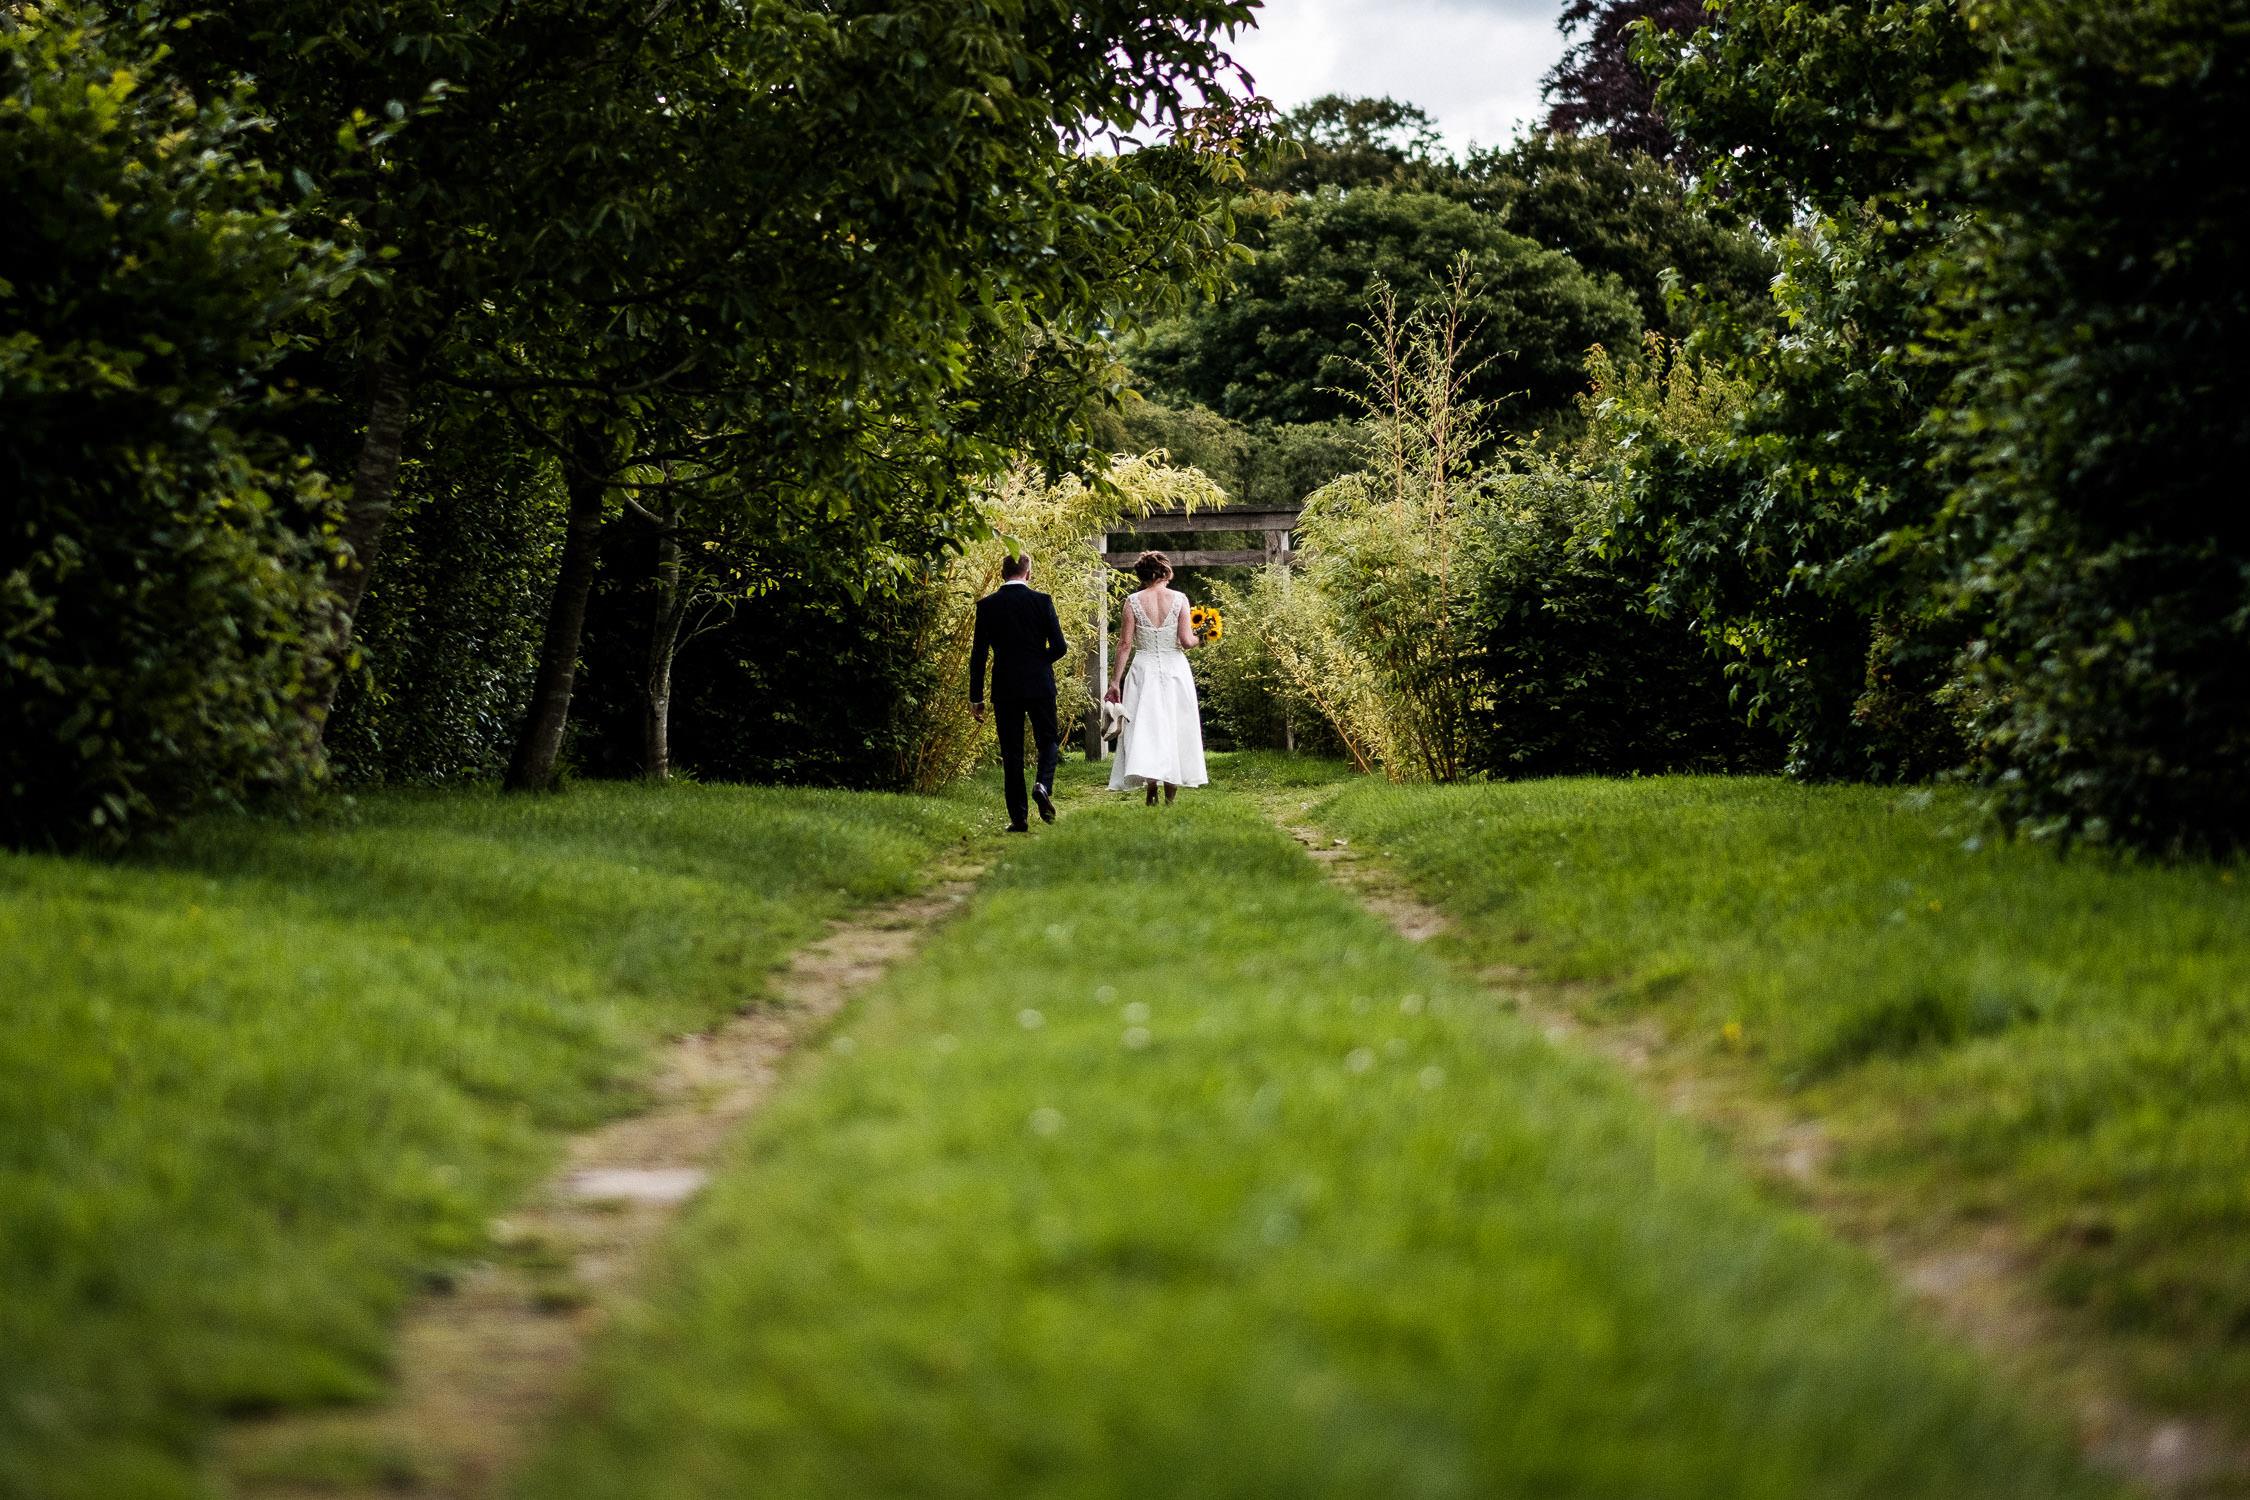 wedding couple walking down path